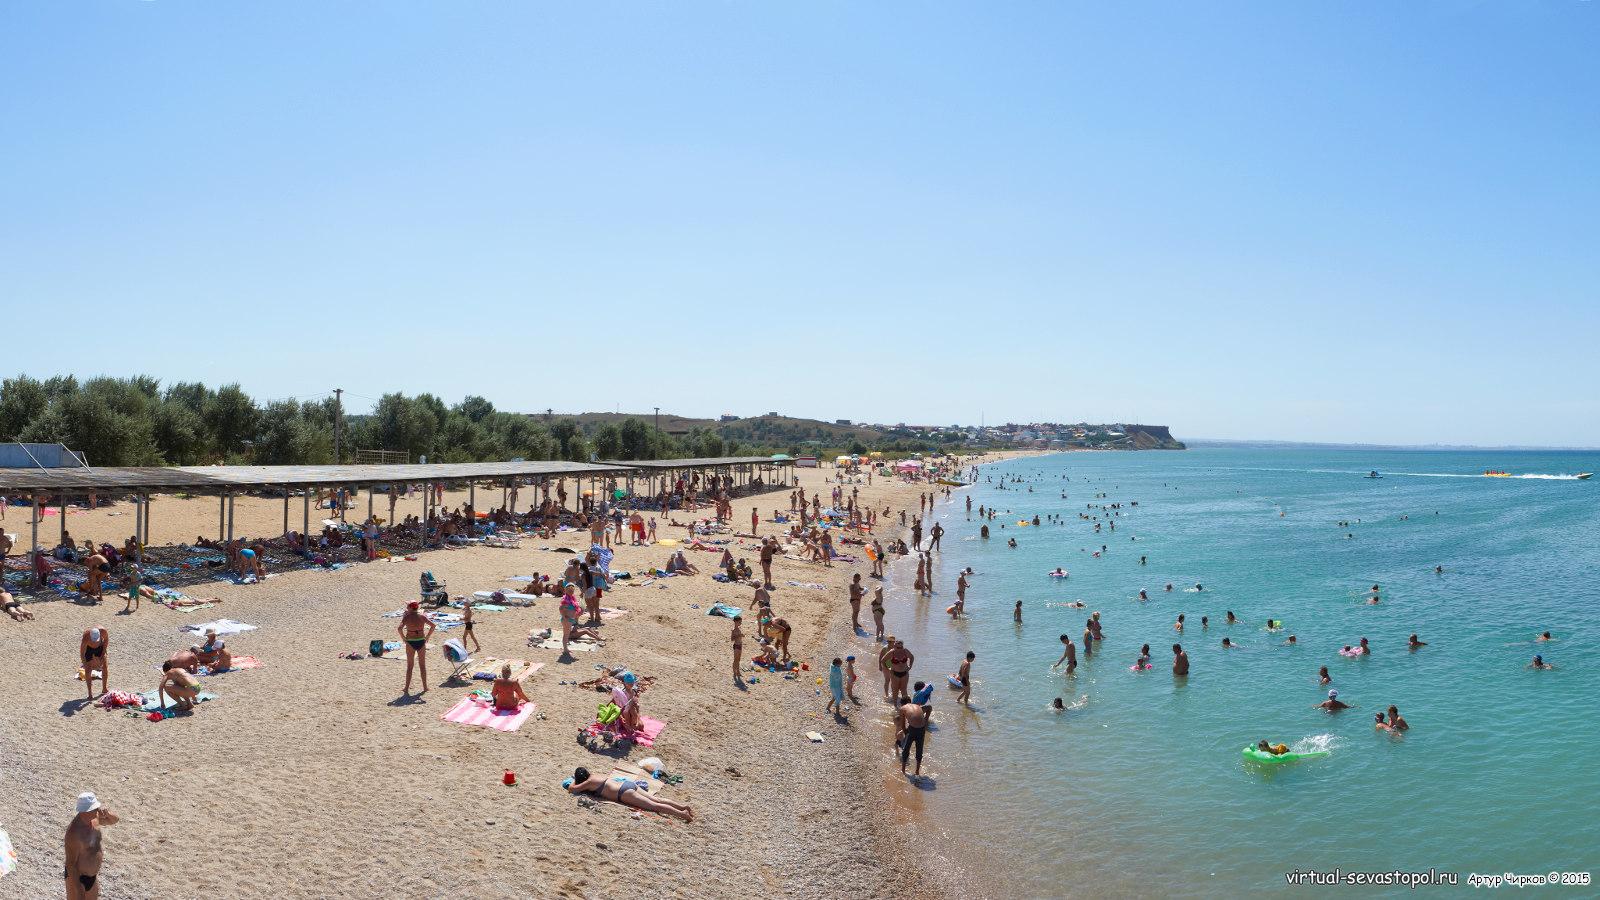 Пляжи кача фото с описанием